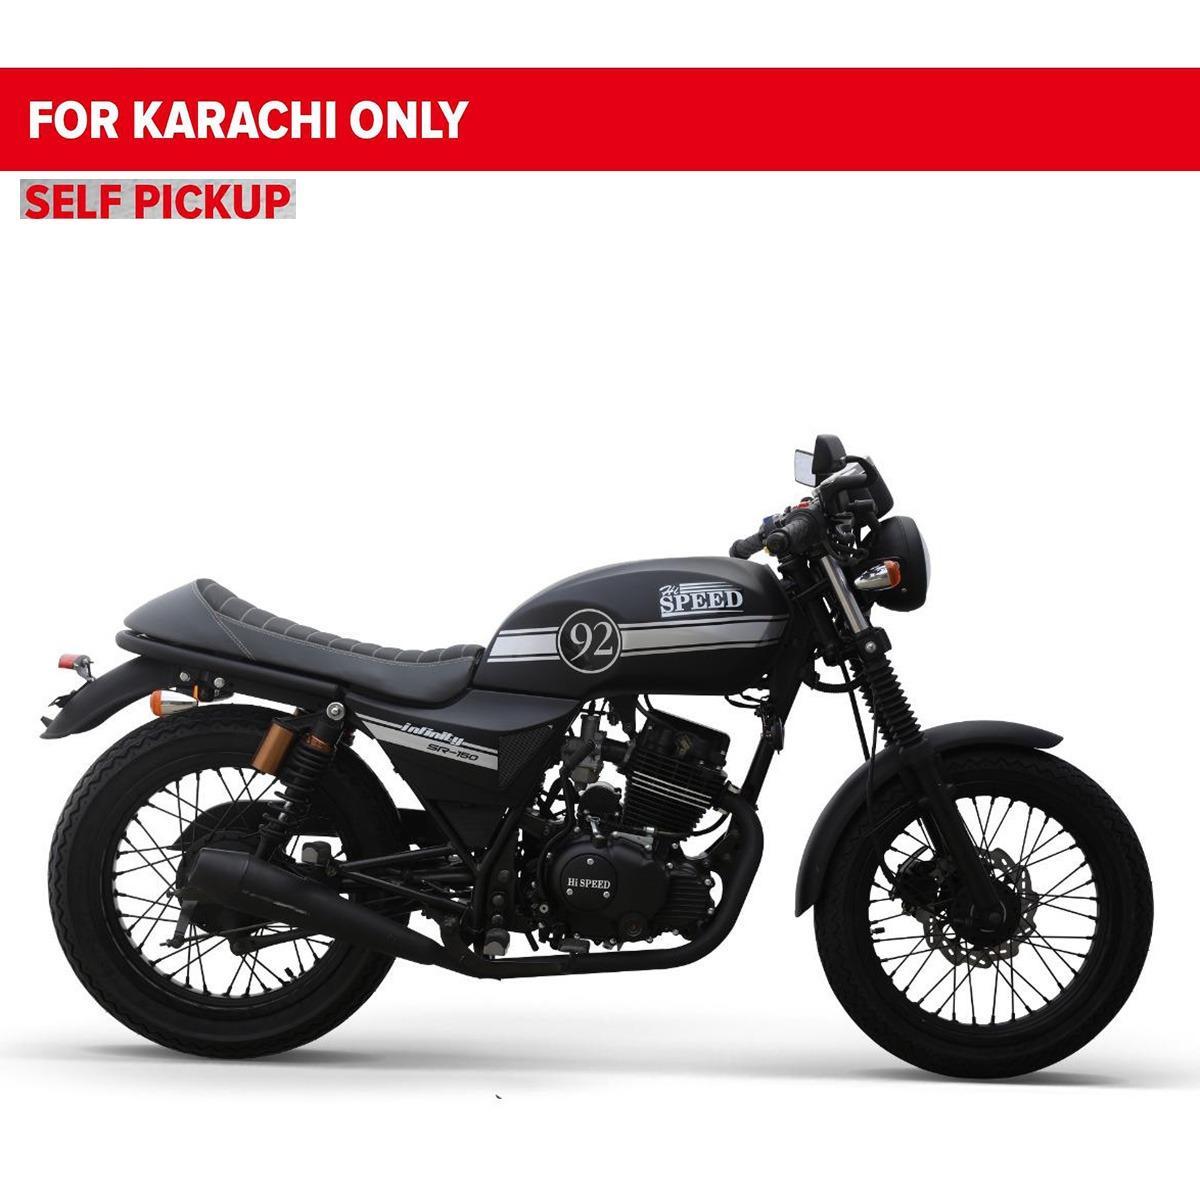 Hi Speed Infinity 150cc - Matt Black (Karachi Only)